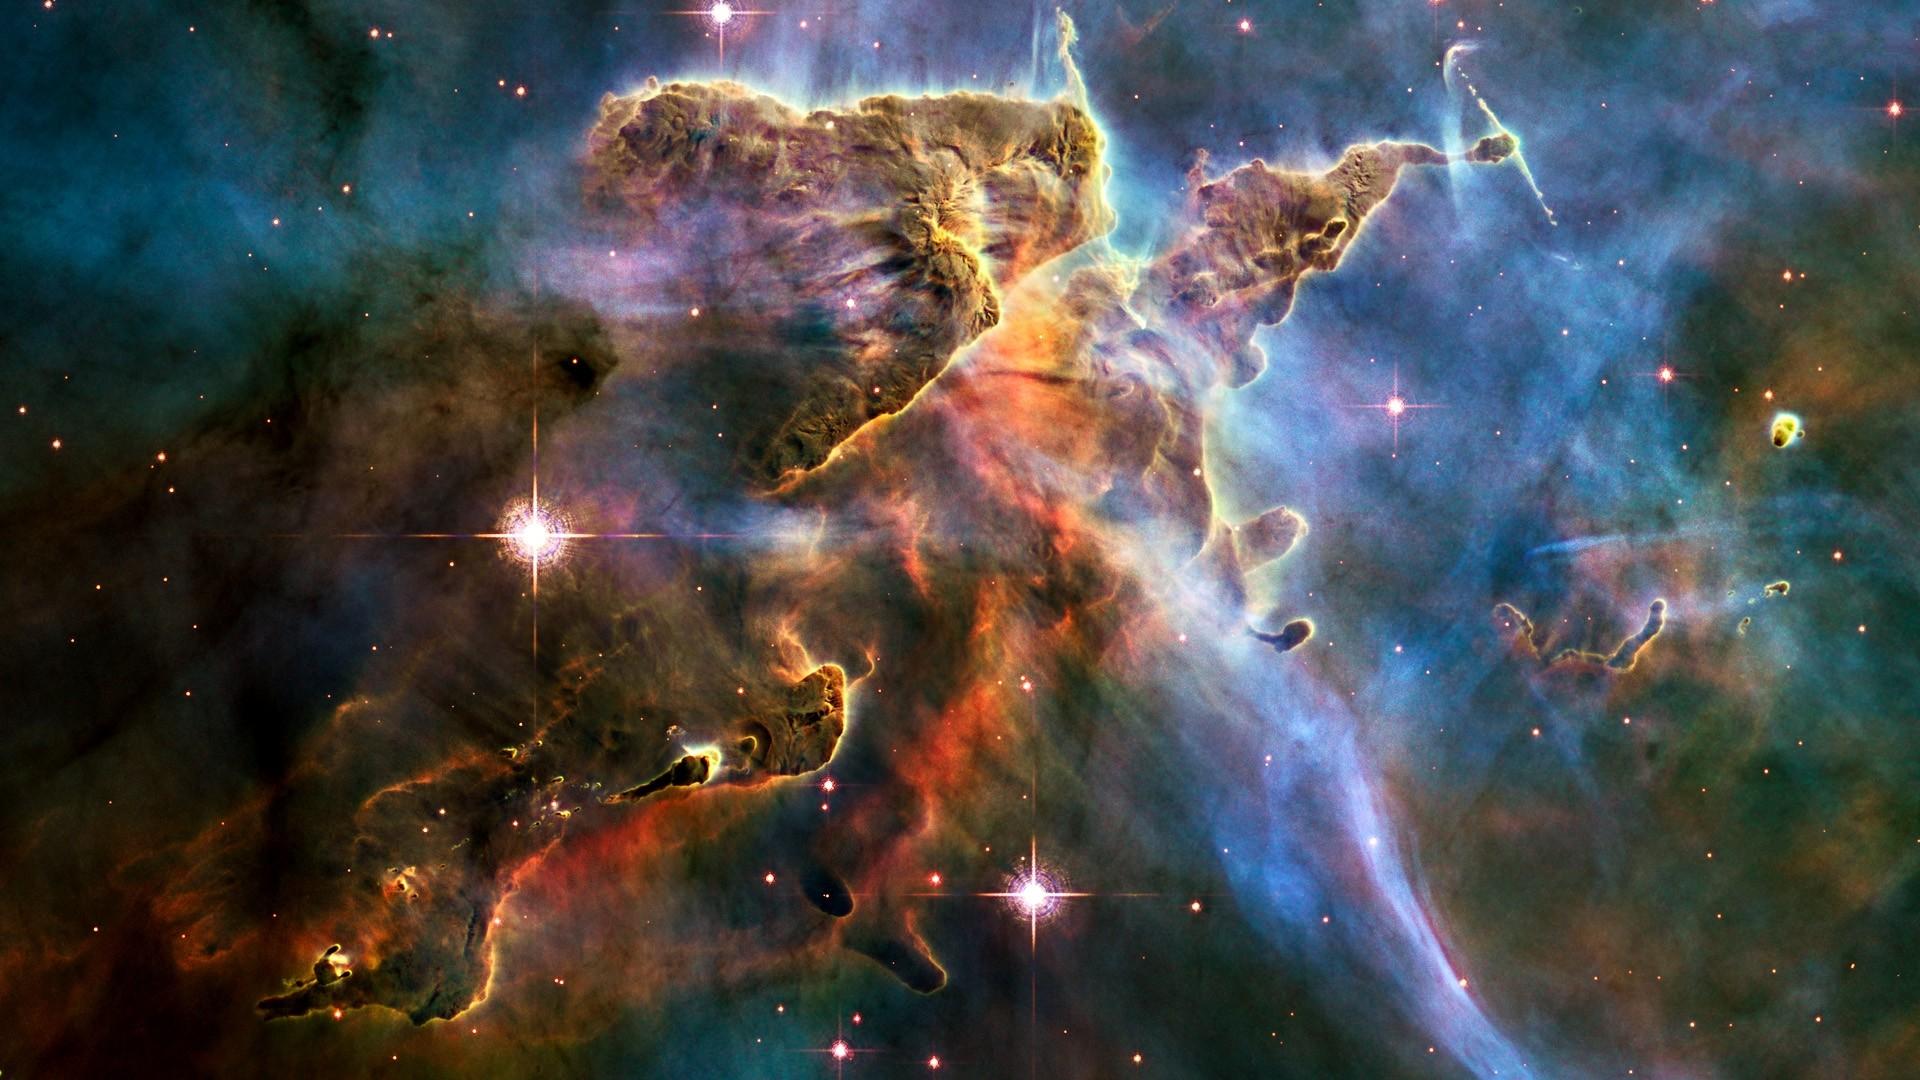 1920 x 1080 jpeg 1351kBPlaystation Desktop Wallpaper Hubble Wallpapers …